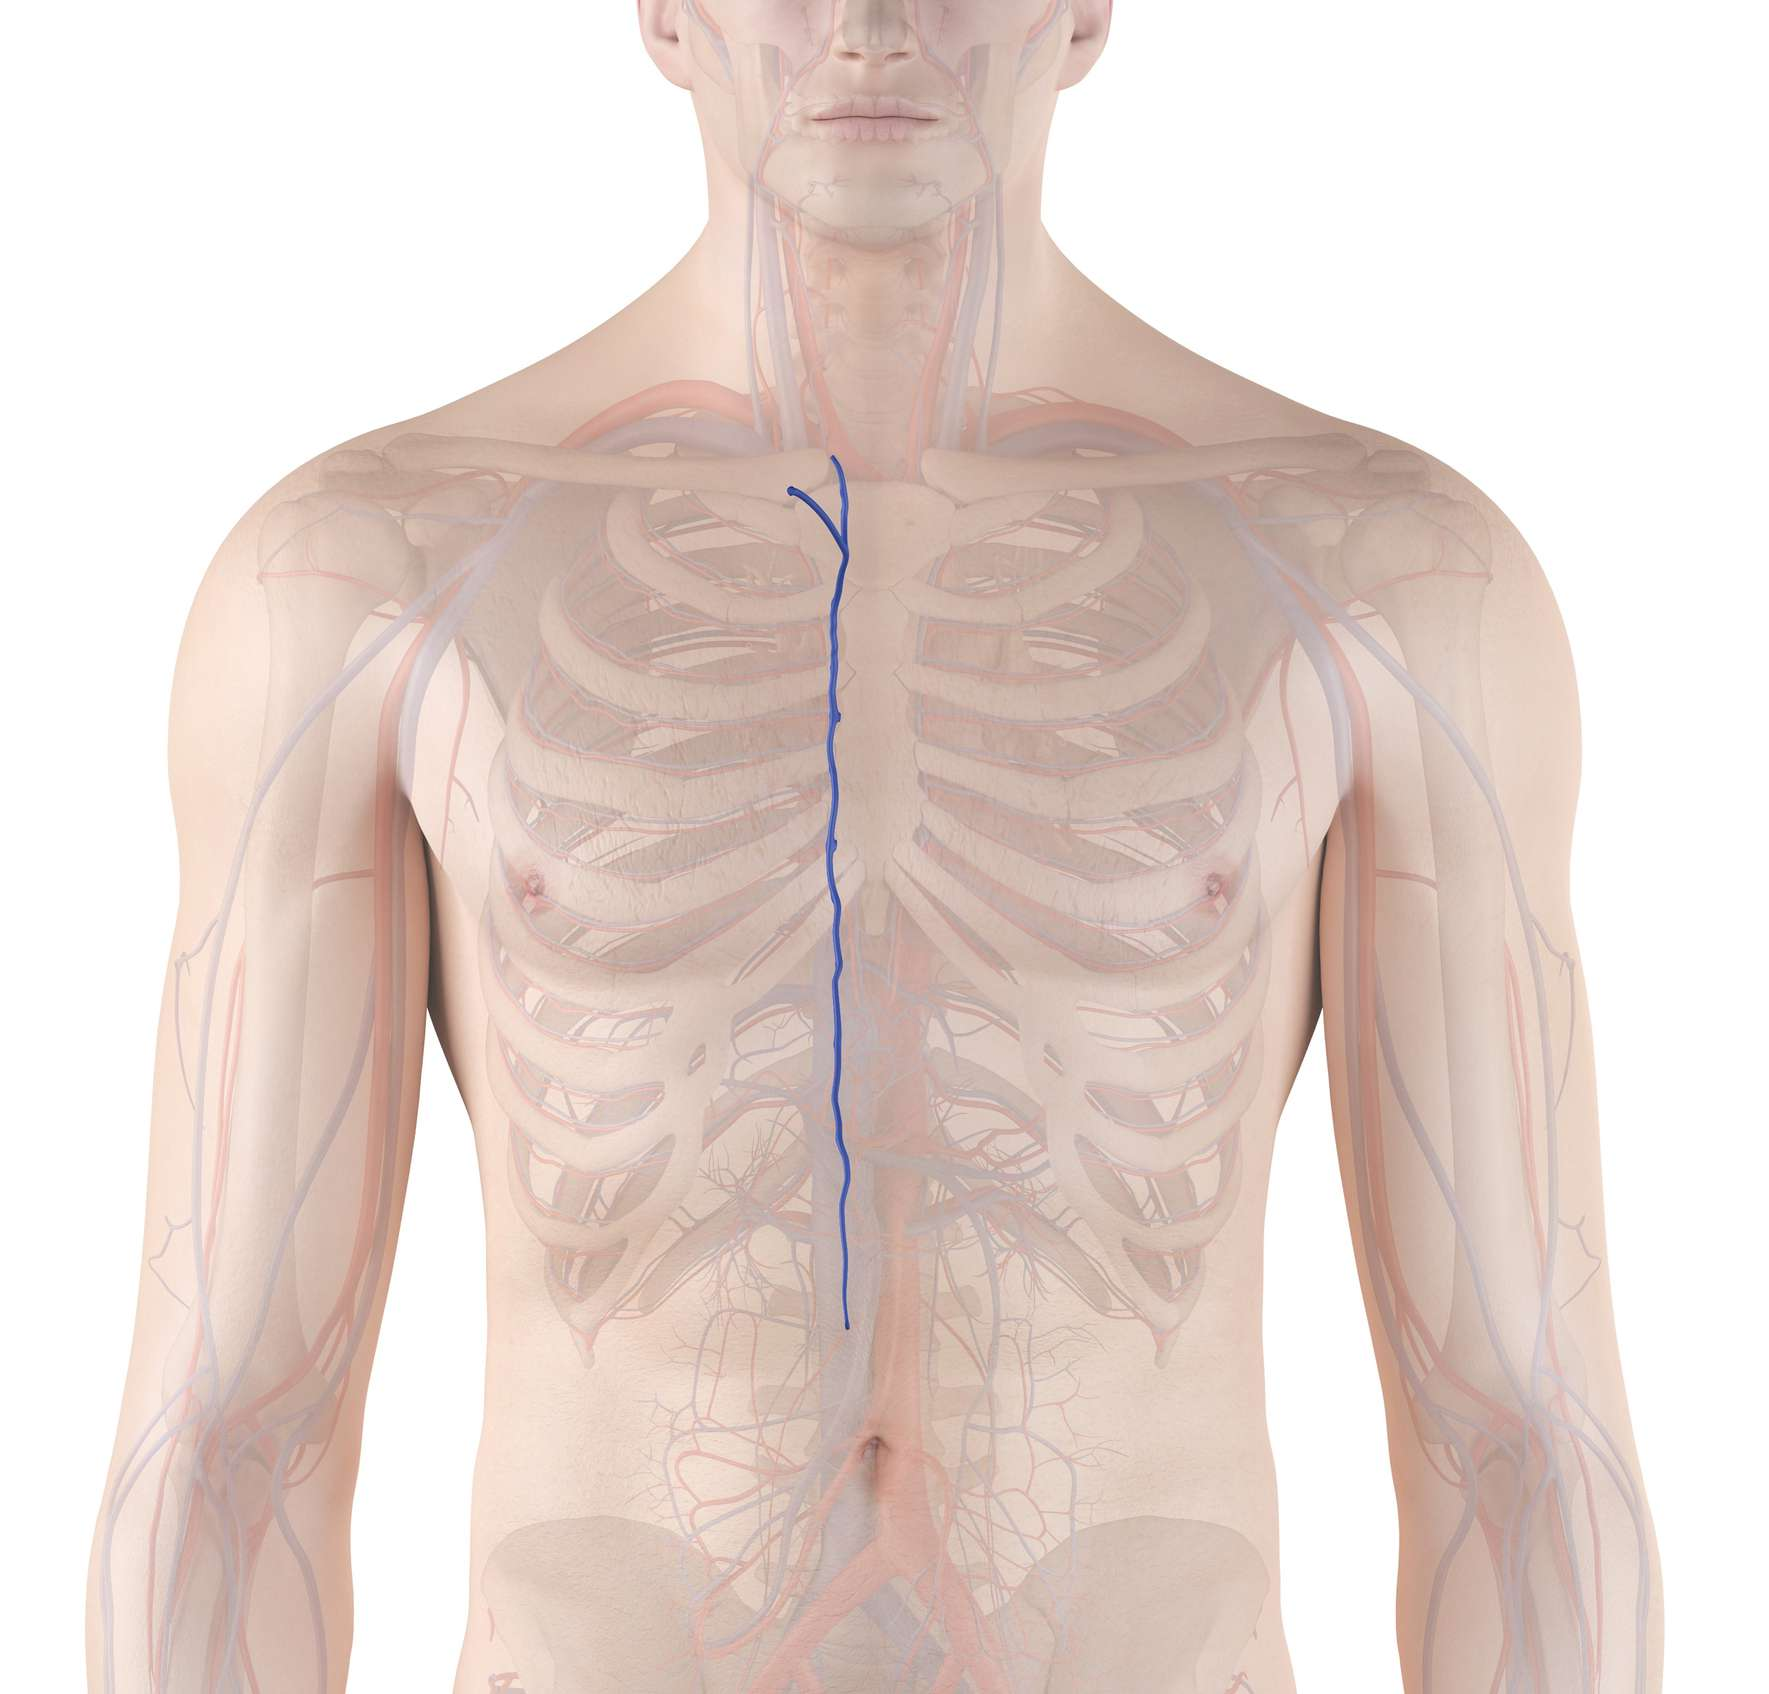 azygos vein in the human vascular system